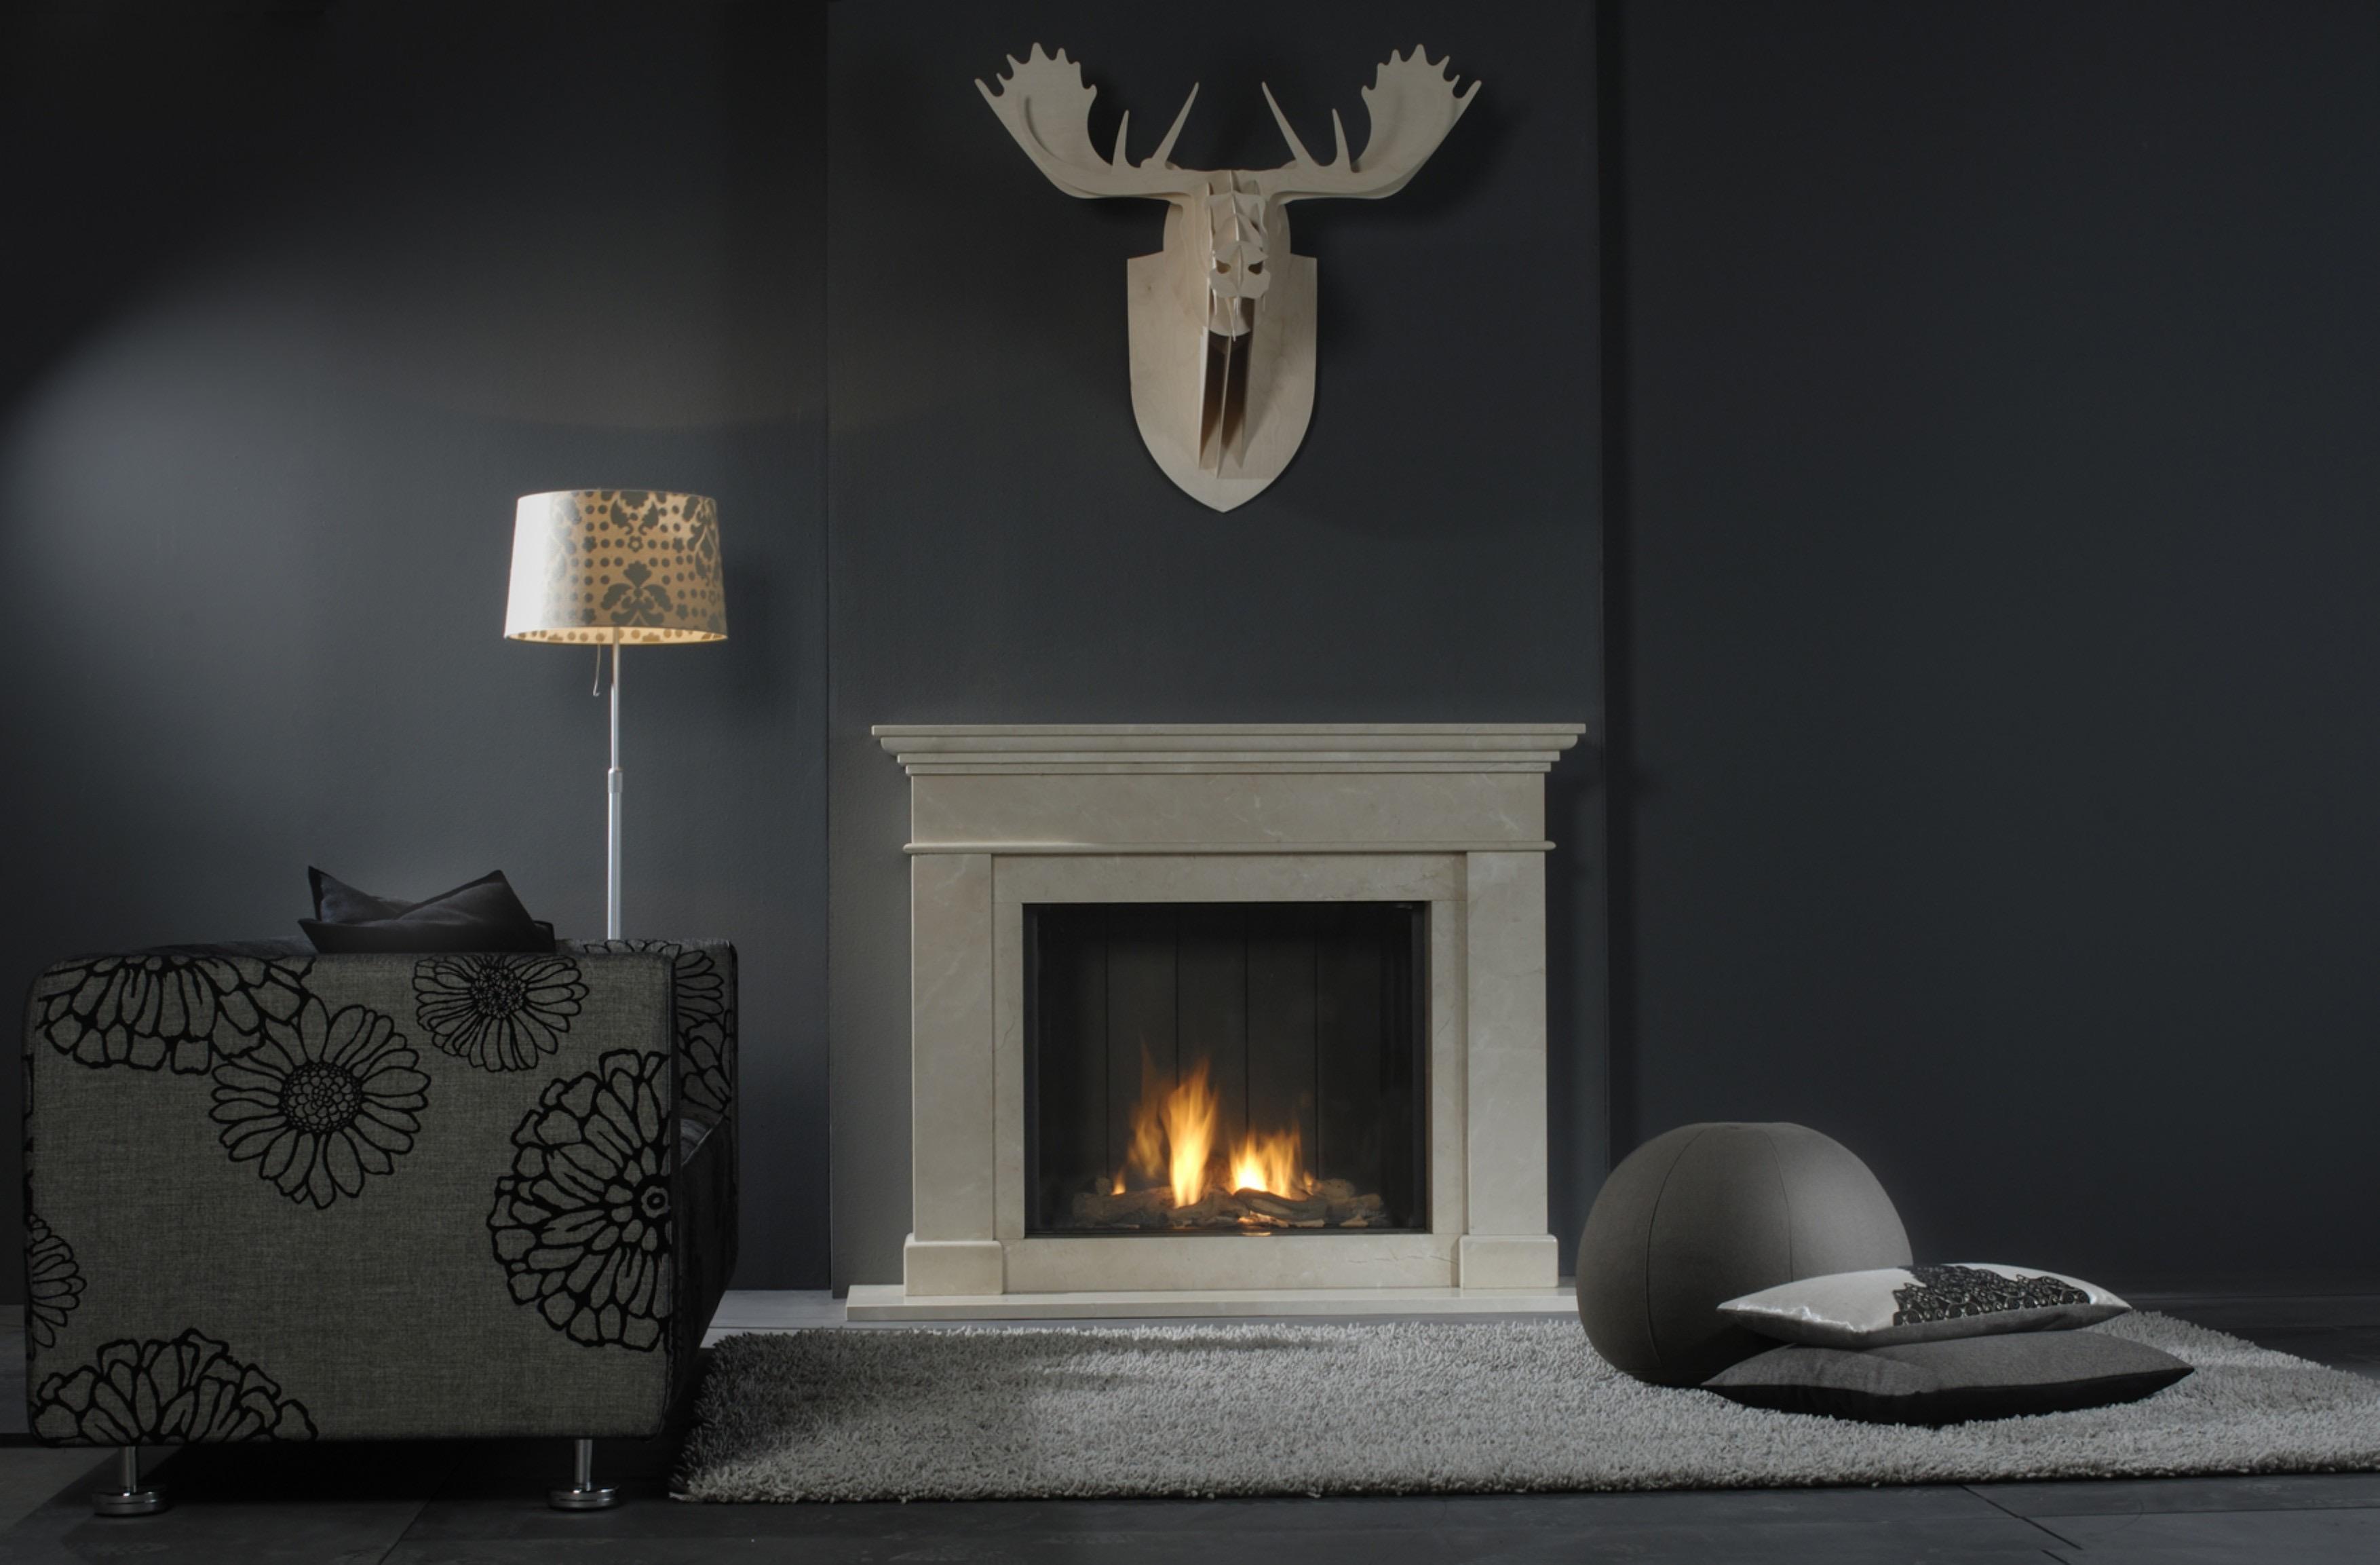 klassische gas kamine hhk hamburger kamine gmbh. Black Bedroom Furniture Sets. Home Design Ideas